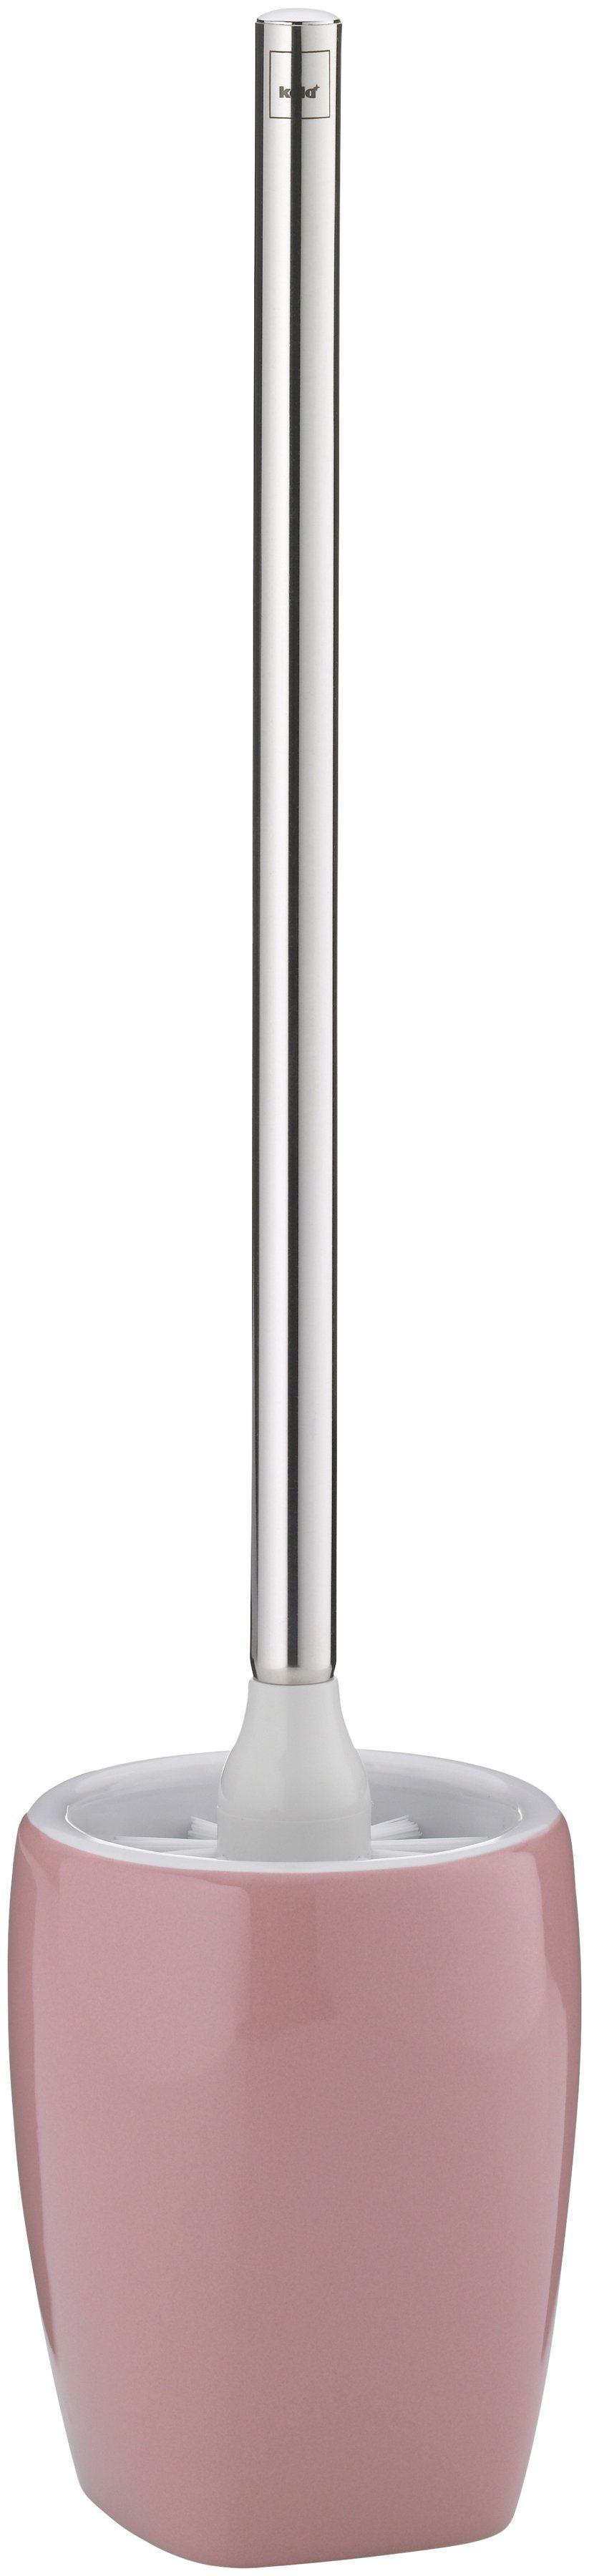 WC-Garnitur »Lindano«, Keramik, Höhe 45 cm, Ø 12 cm